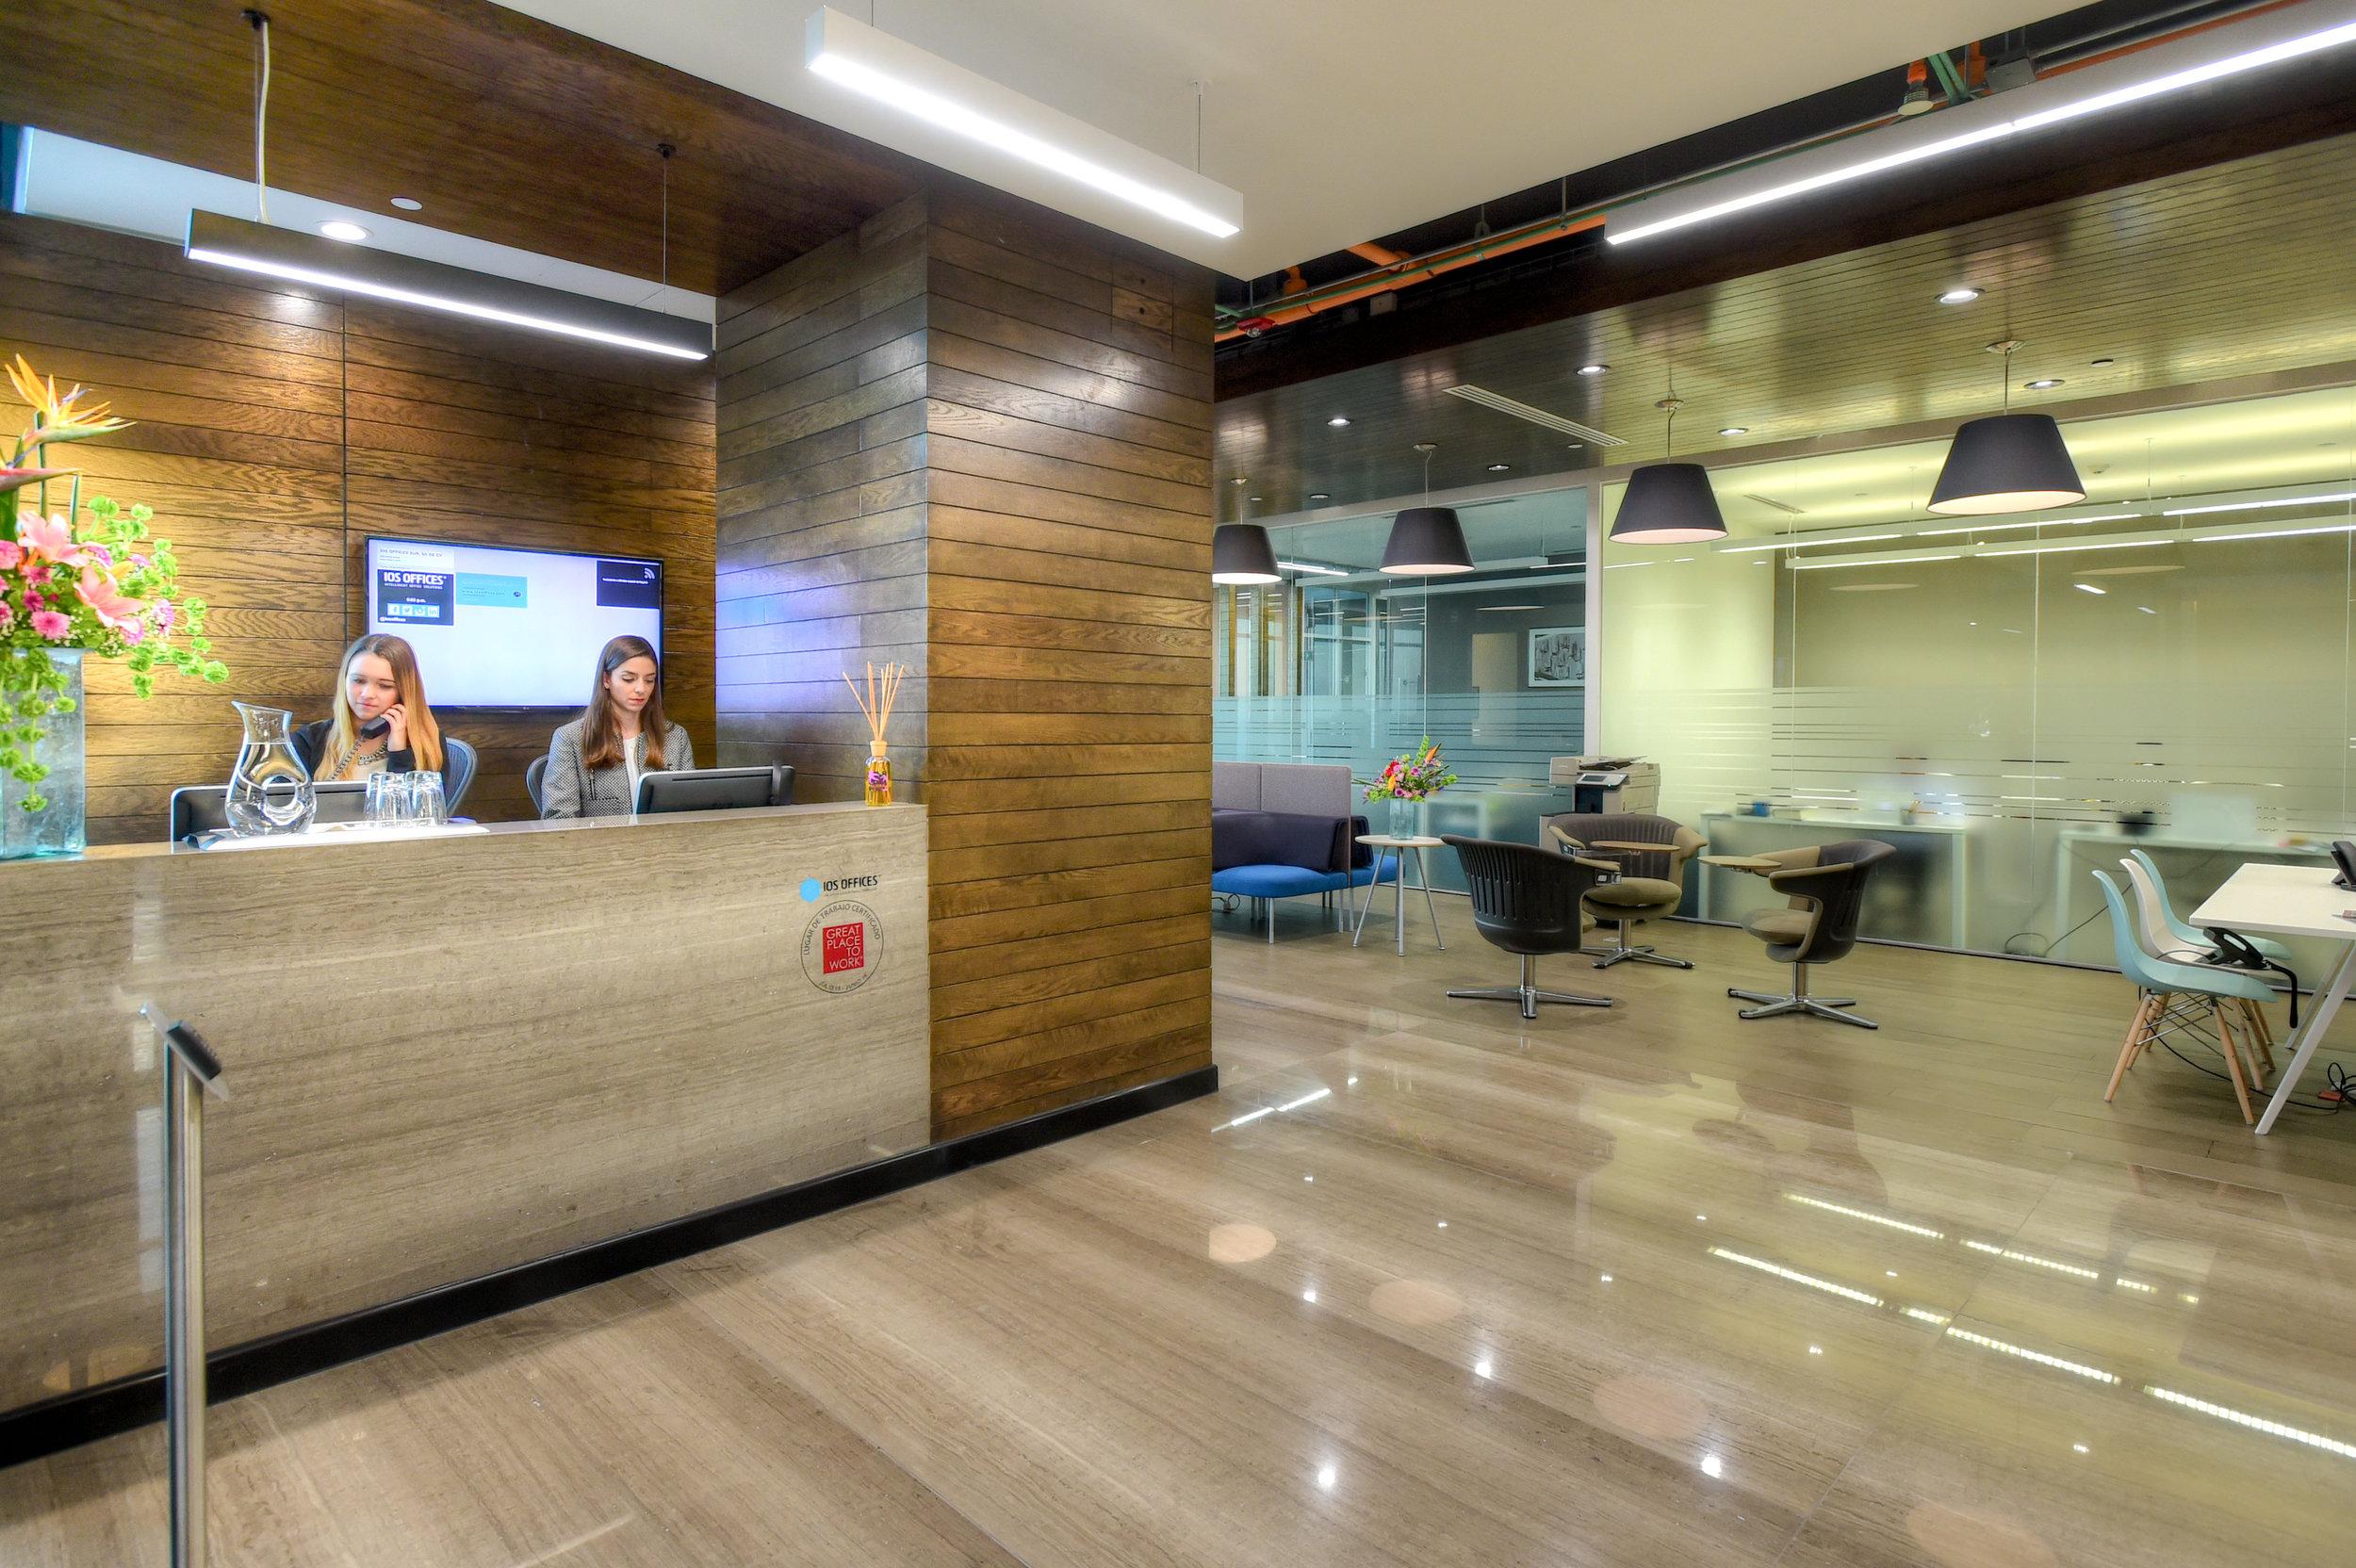 045_iosMerida_Arquitectura.jpg